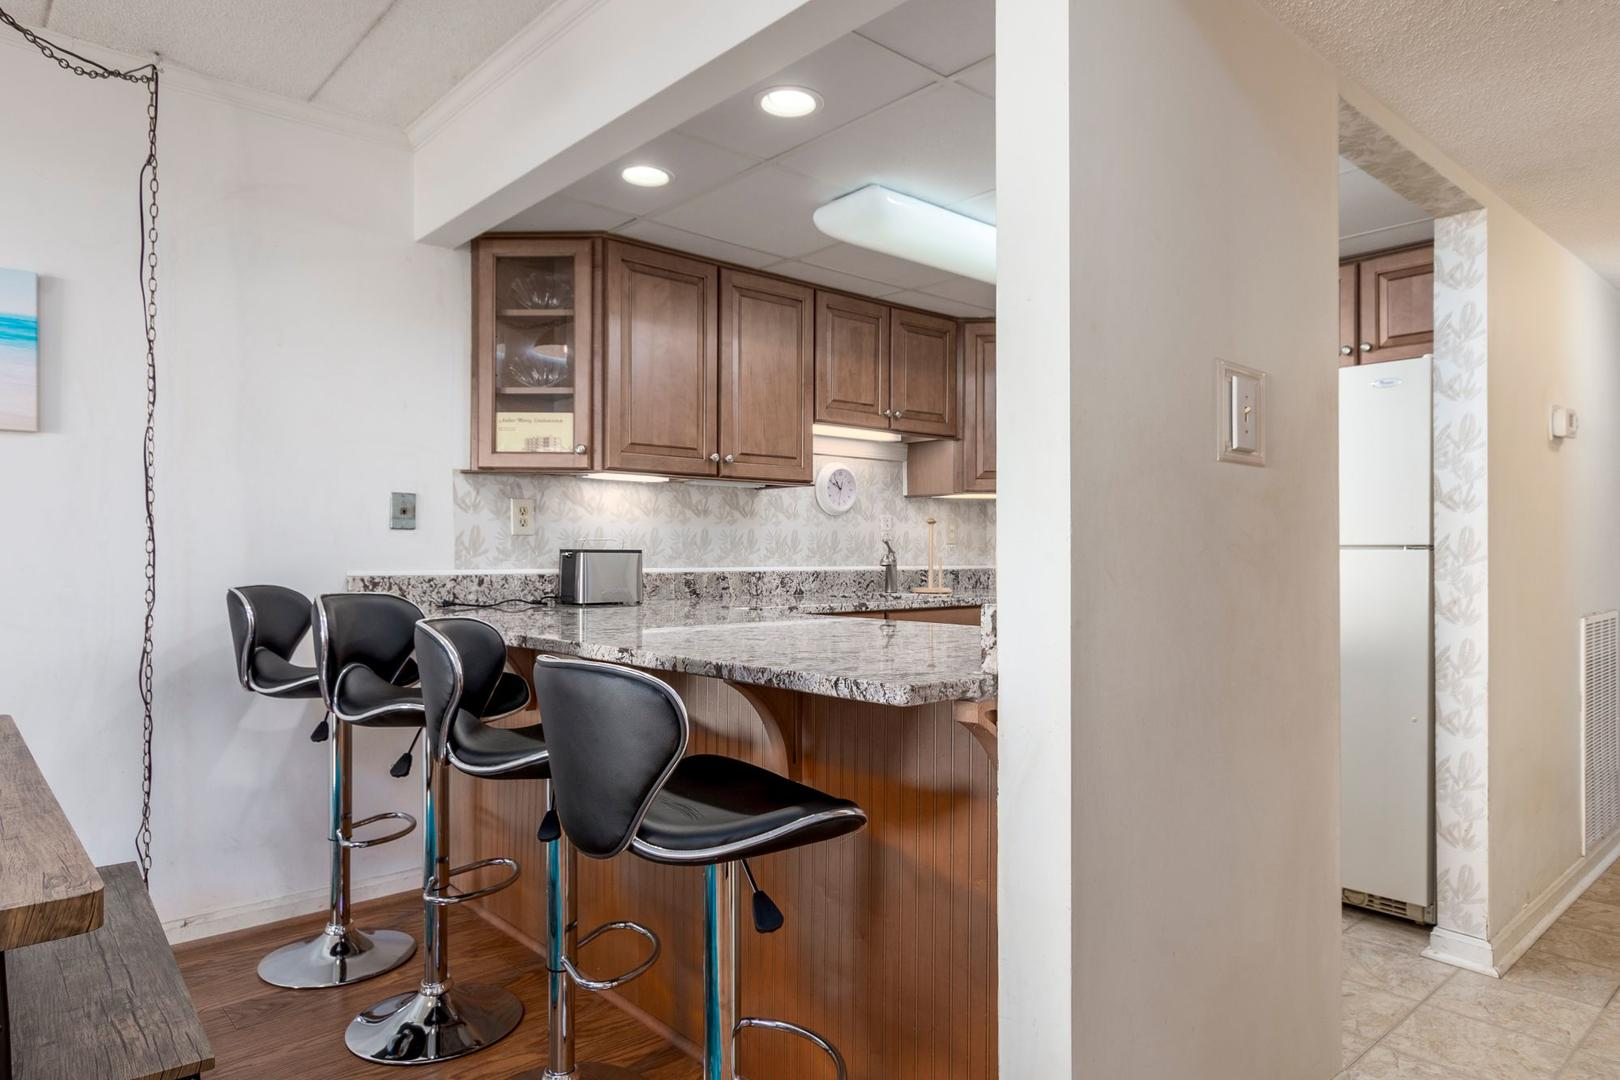 Amber Waves 101 - Renovated Kitchen